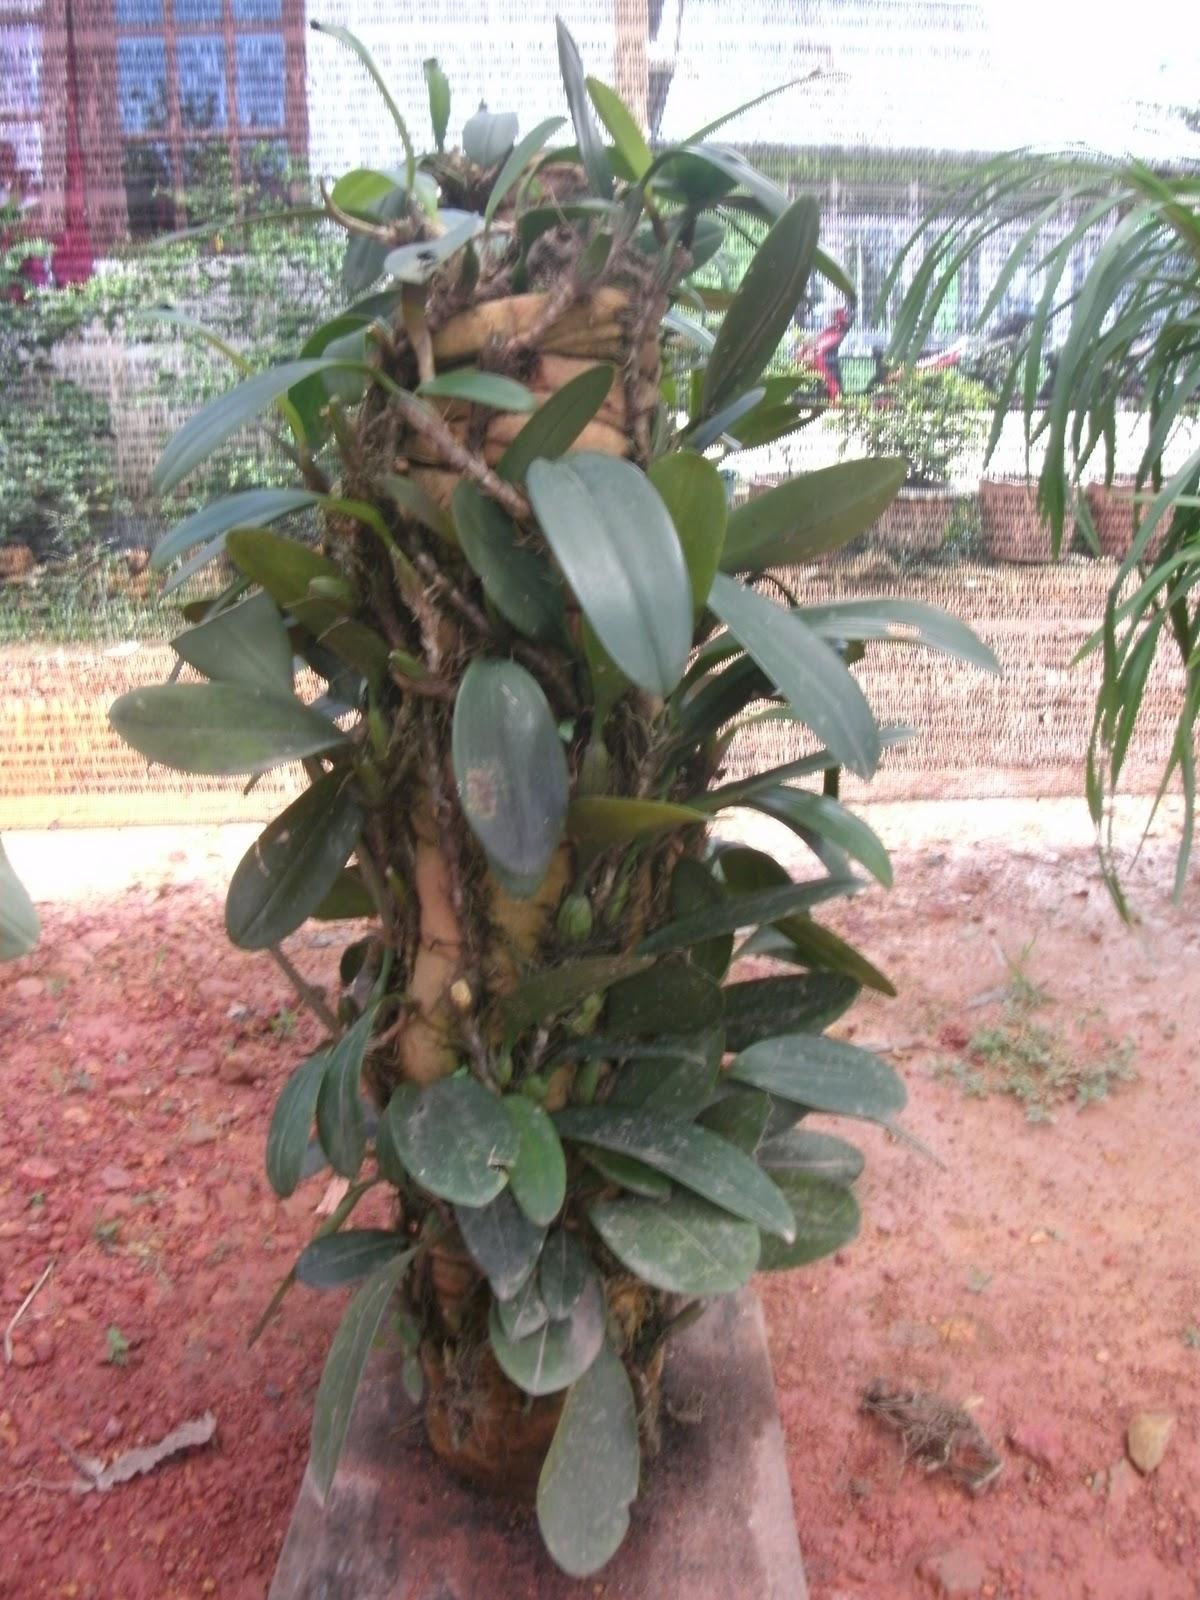 Anggrek Kalimantan godean.web.id